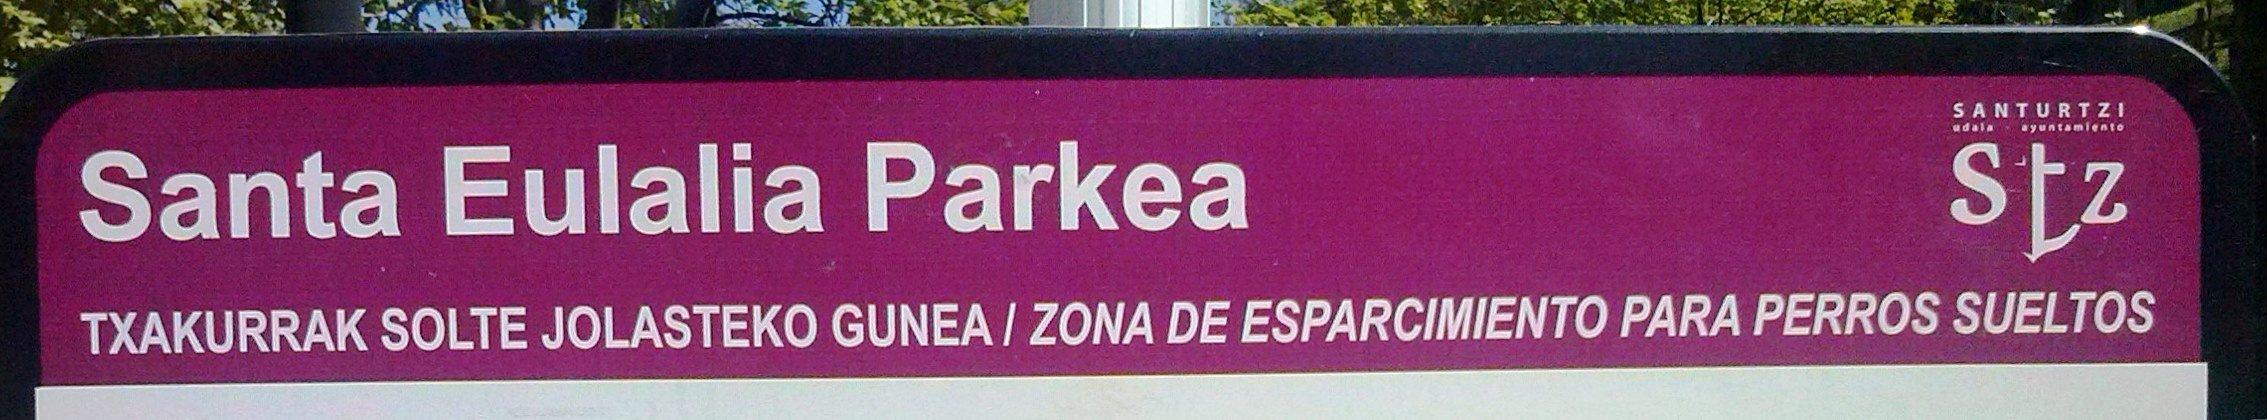 1 Parque Santa Eulalia - copia